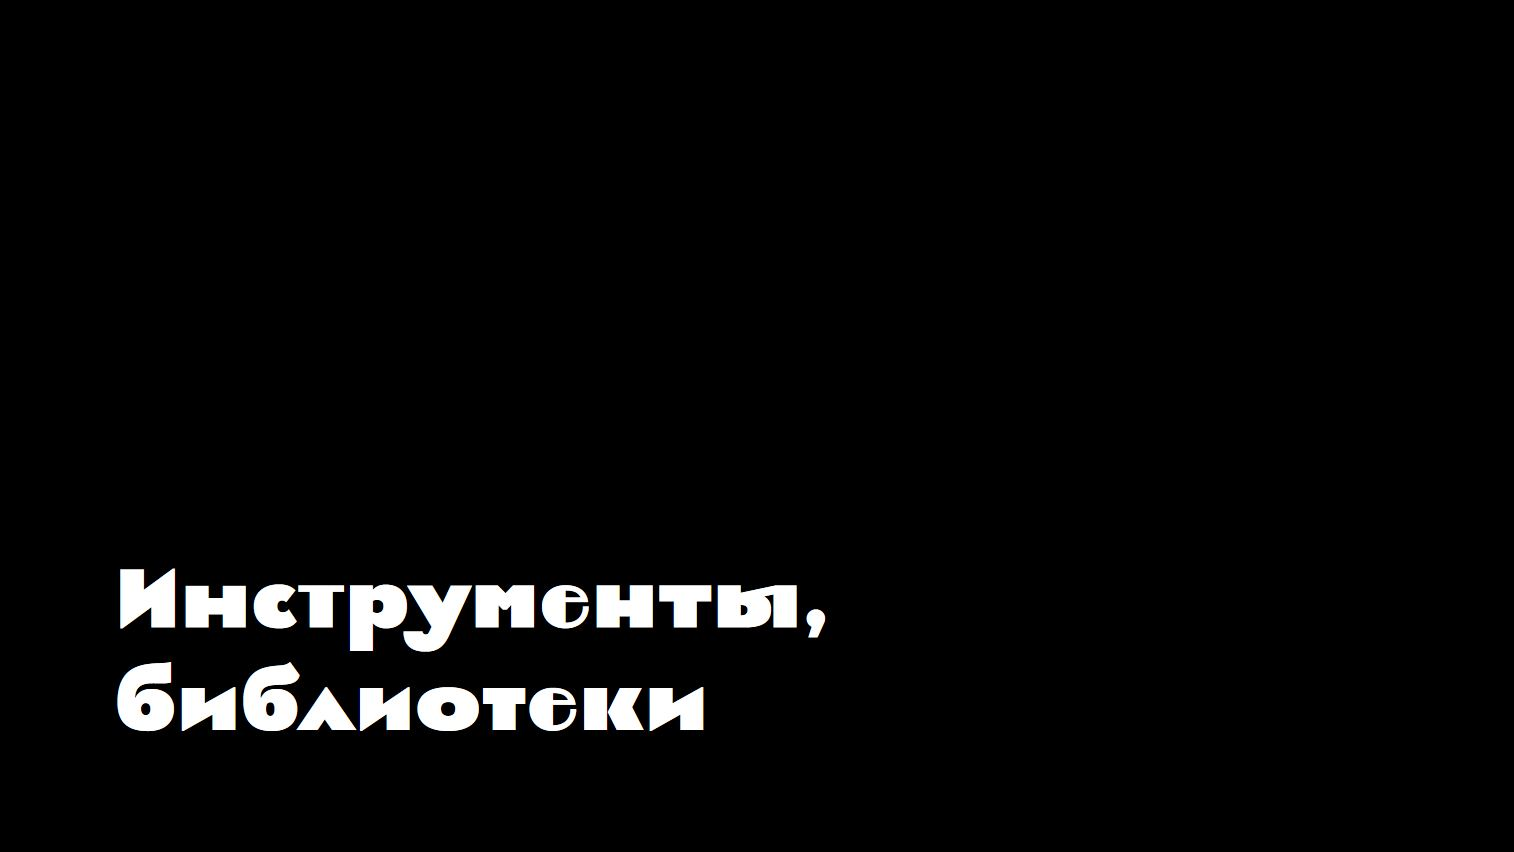 Дмитрий Ульмер-Морозов - WebGL - 30